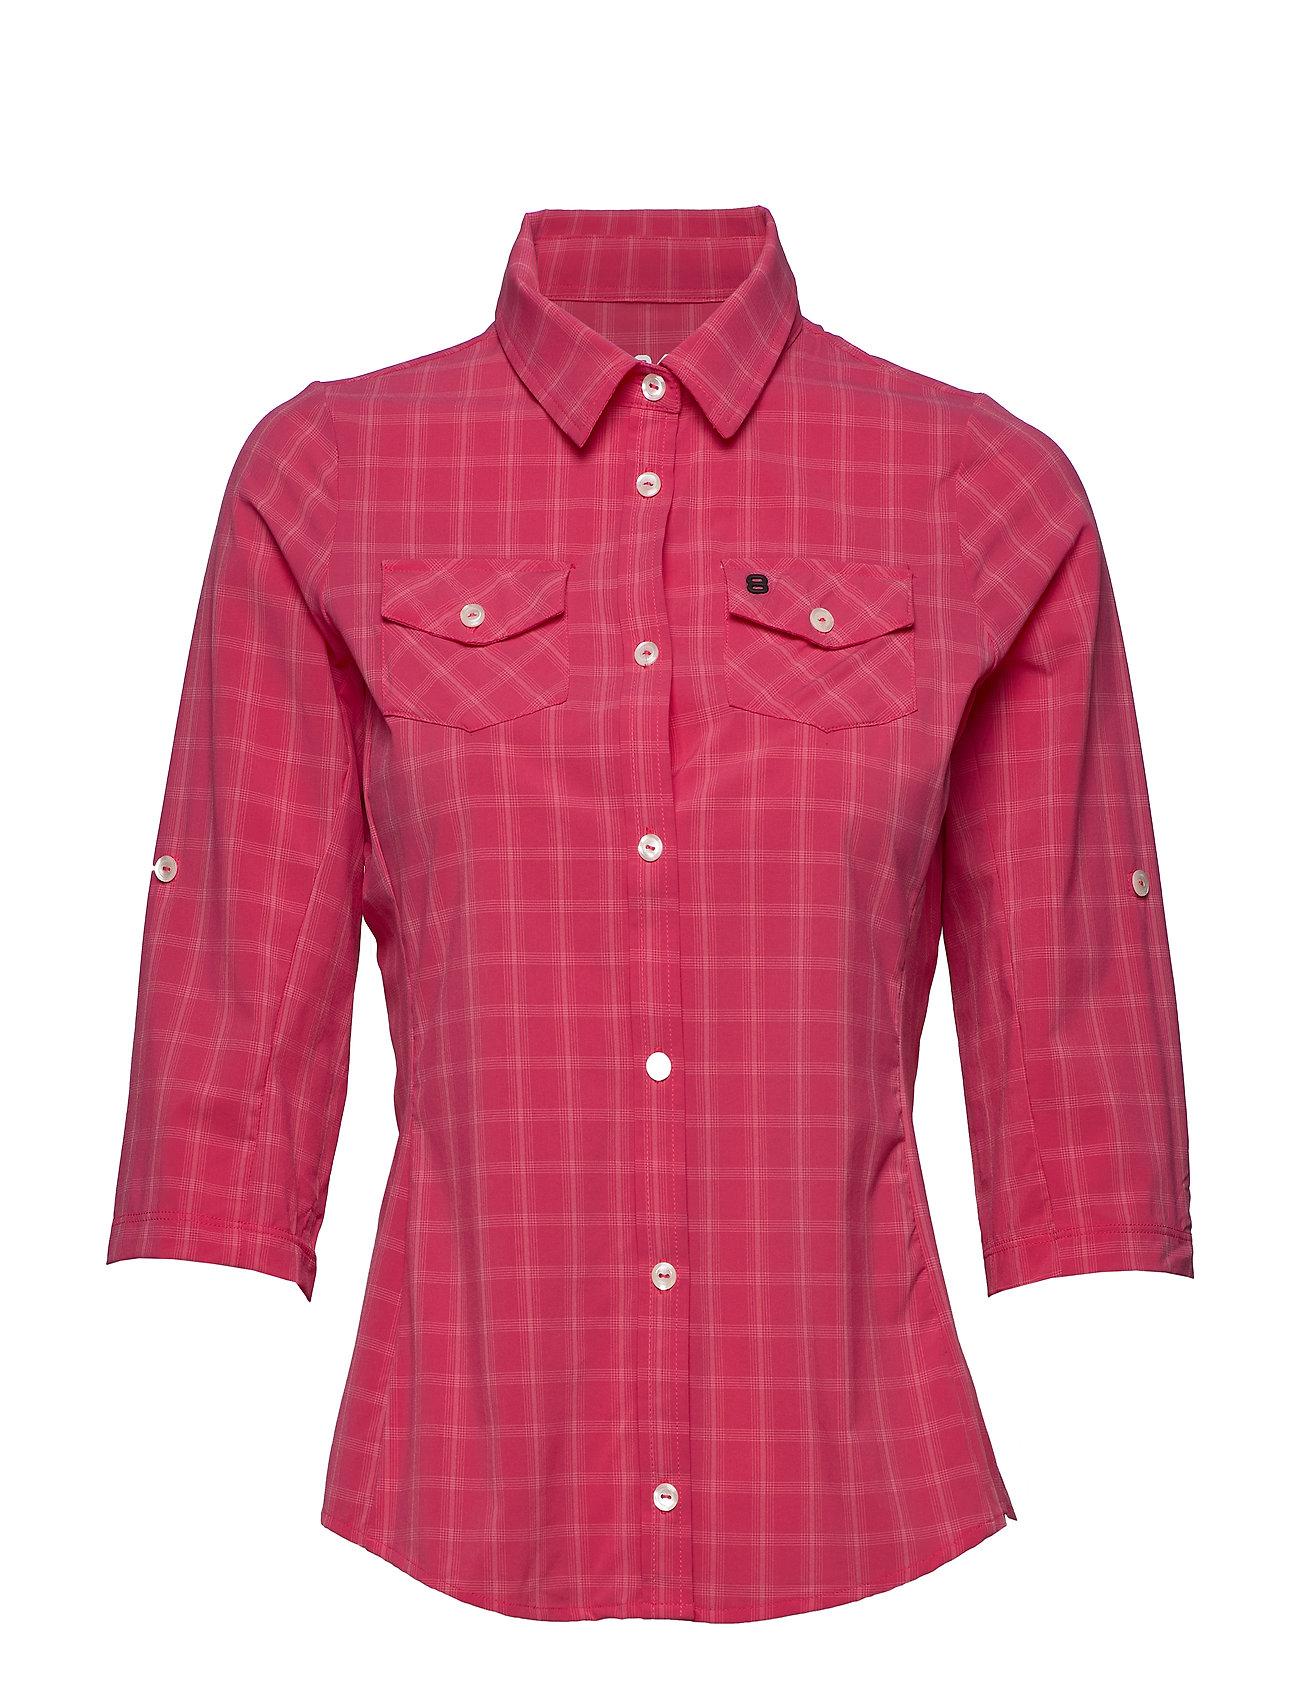 8848 Altitude Swanson W Shirt - MAGENTA